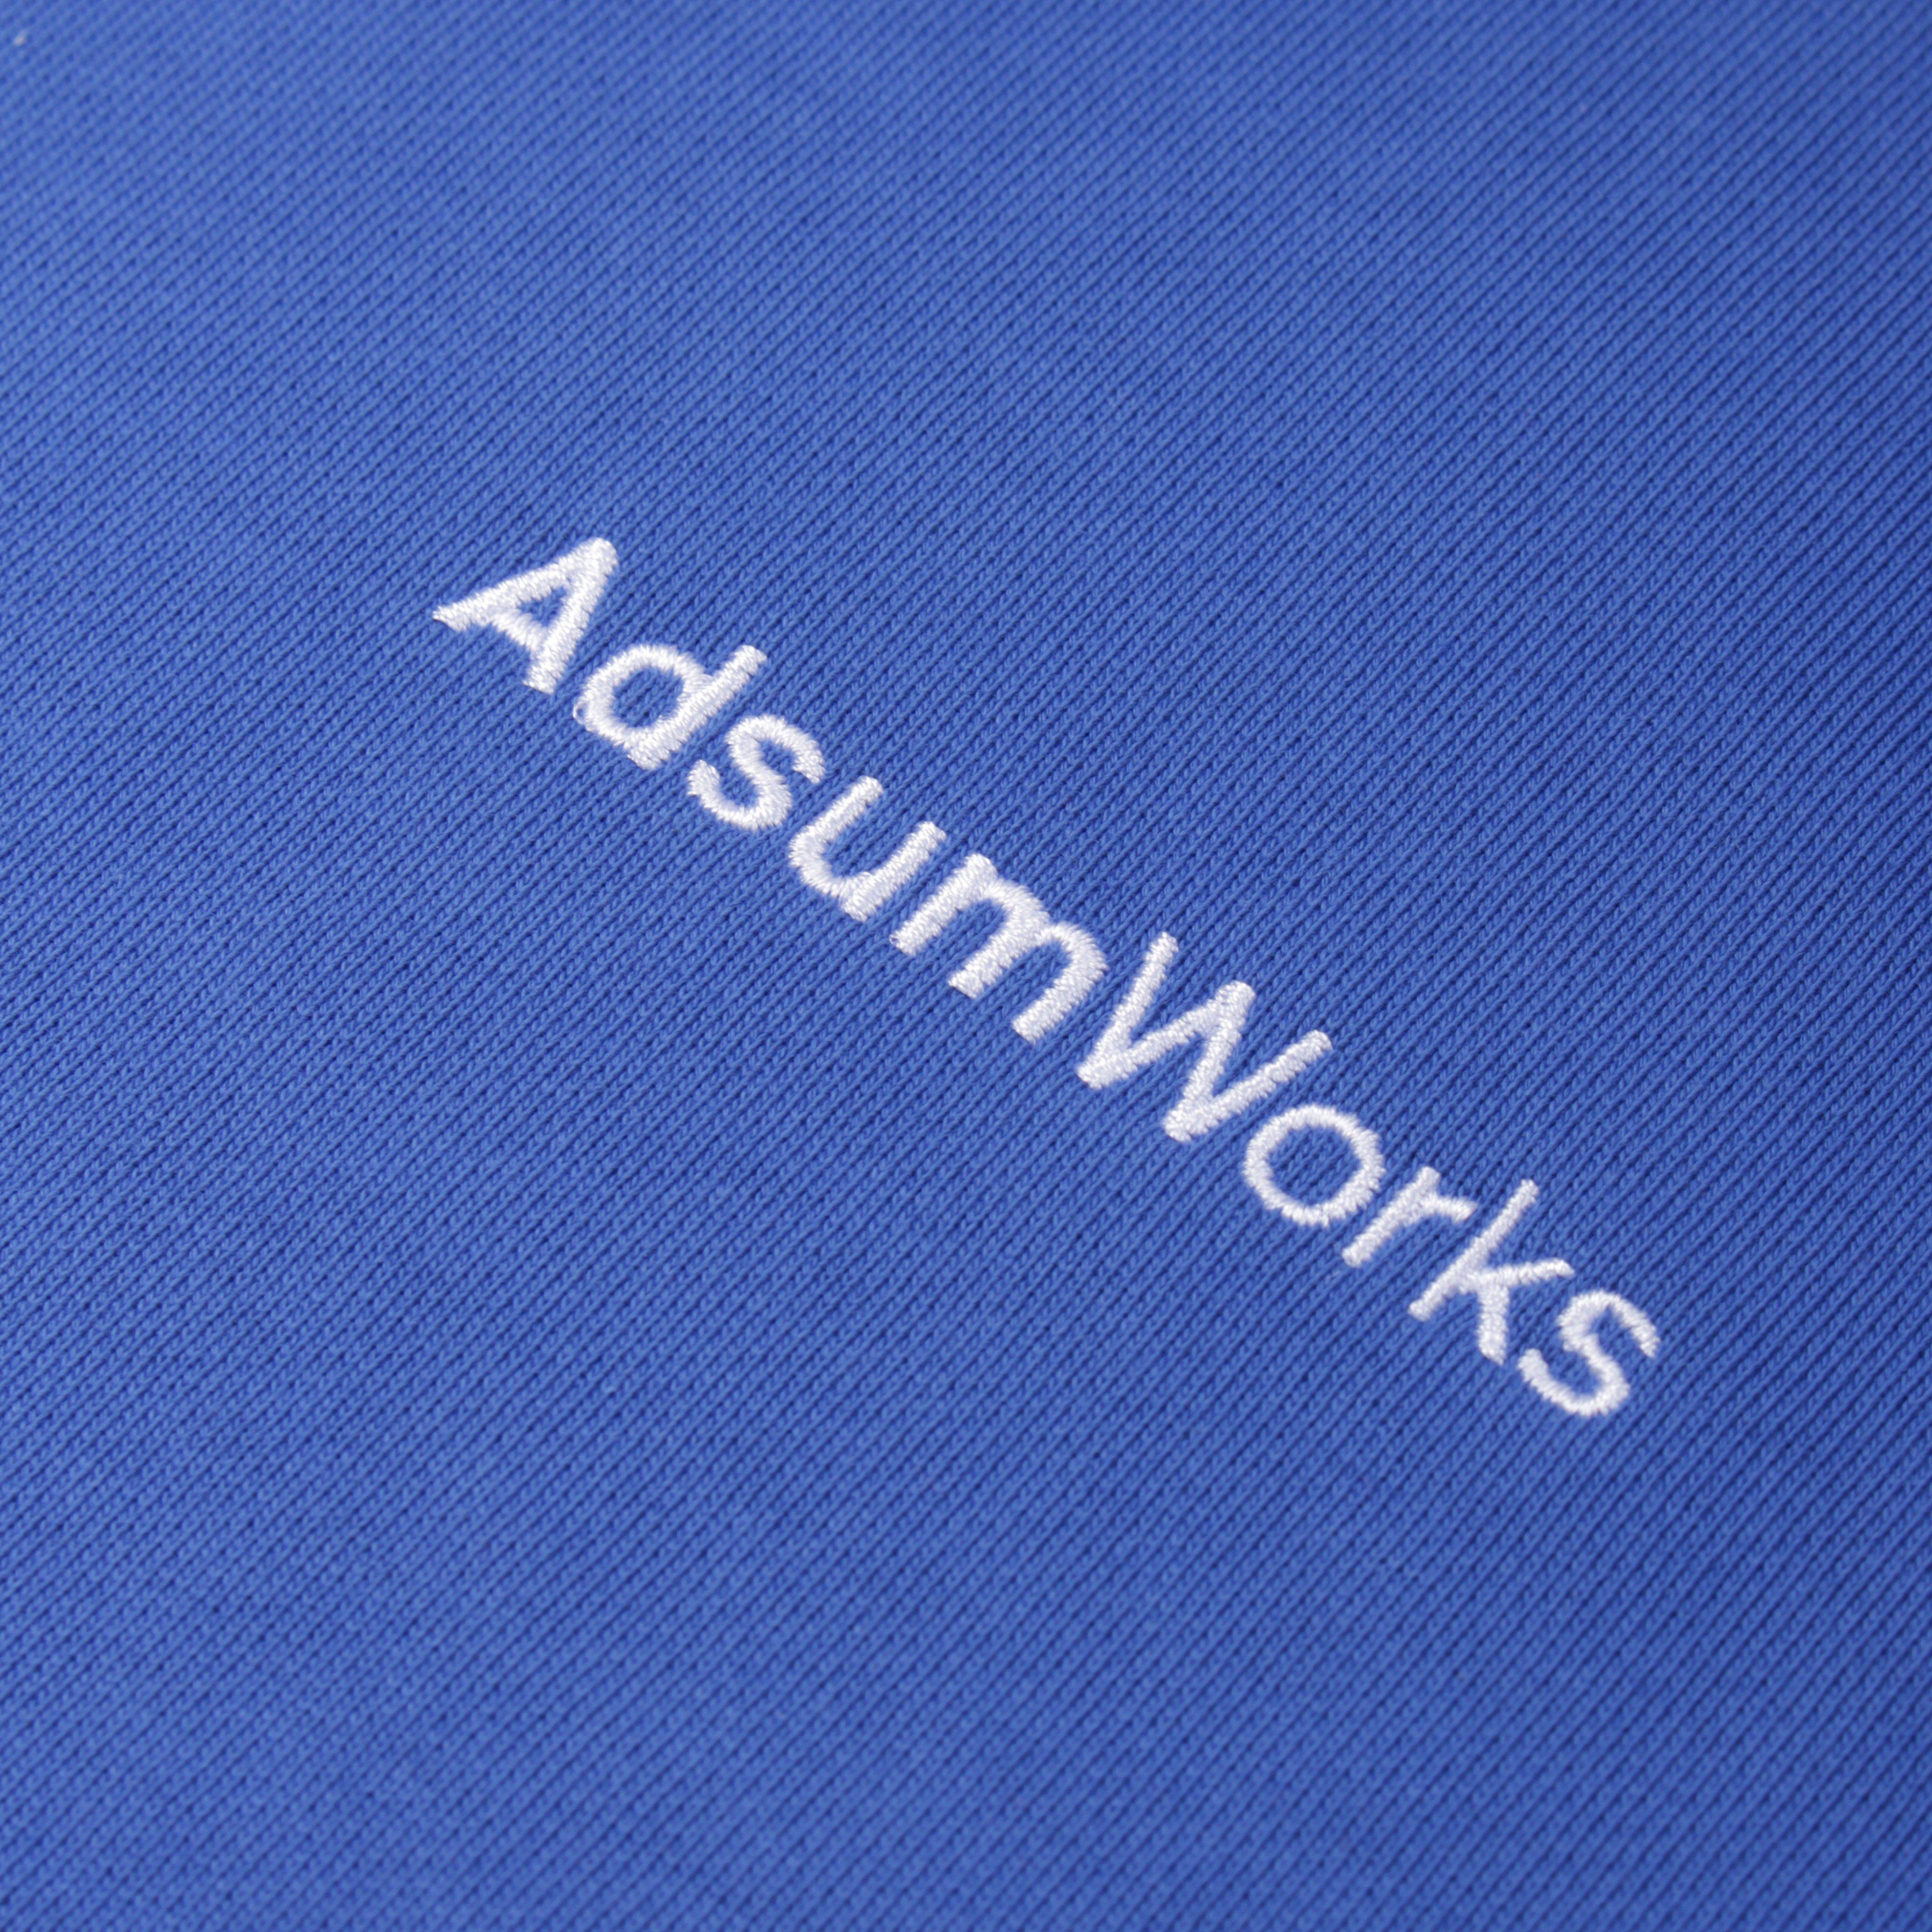 Adsum Adsum Works Overhead Hoodie